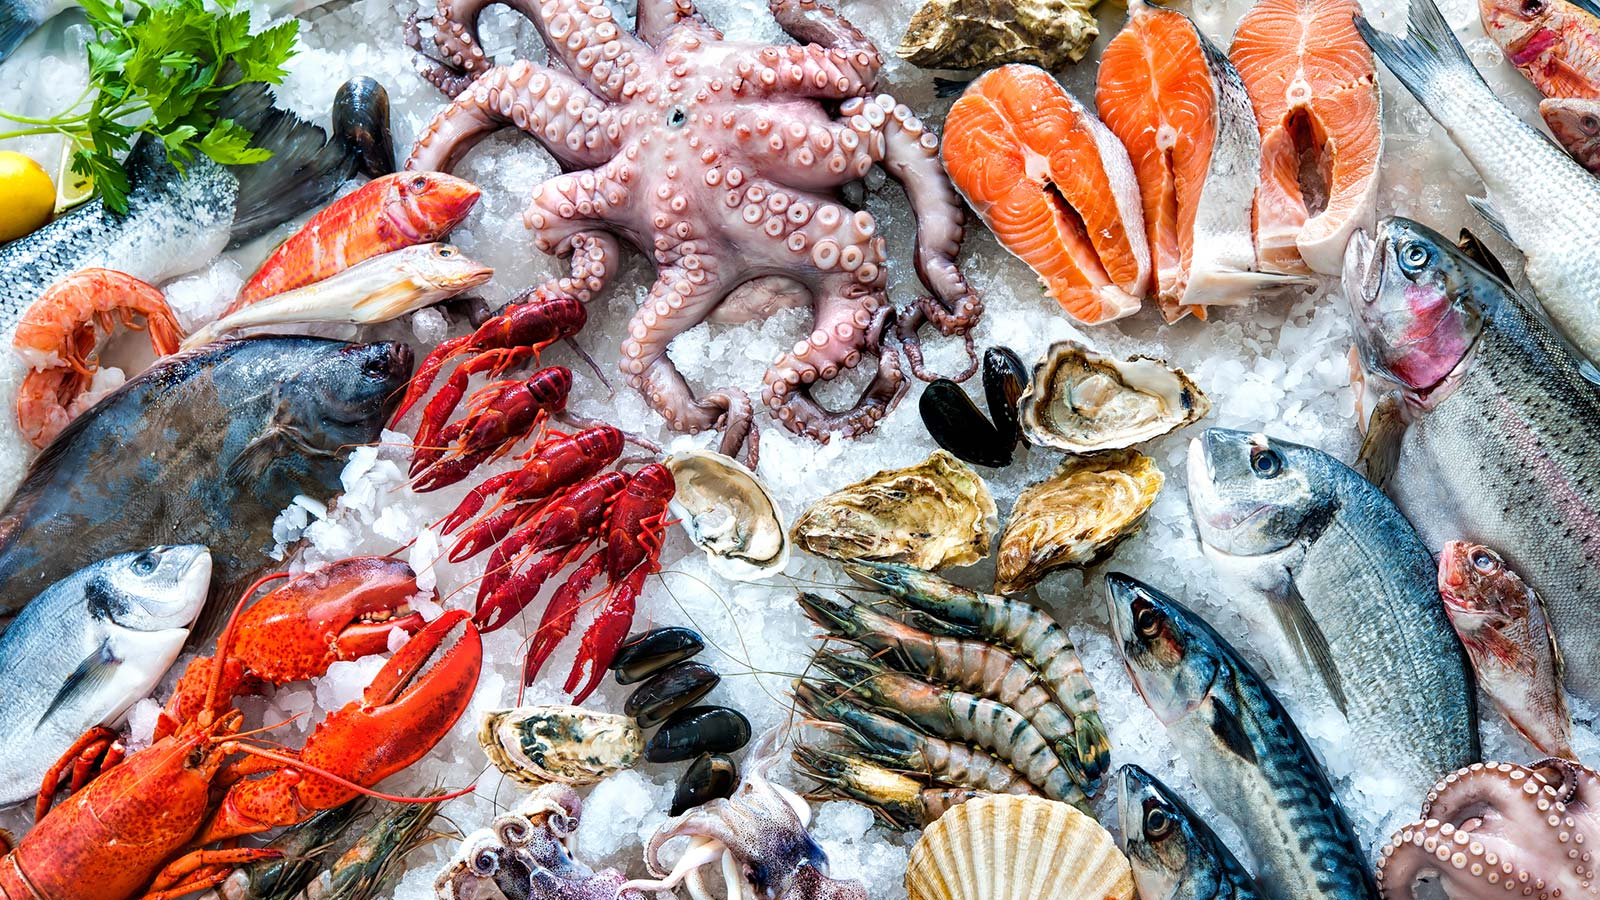 Groeiende vis en zeevruchten markt Mexico